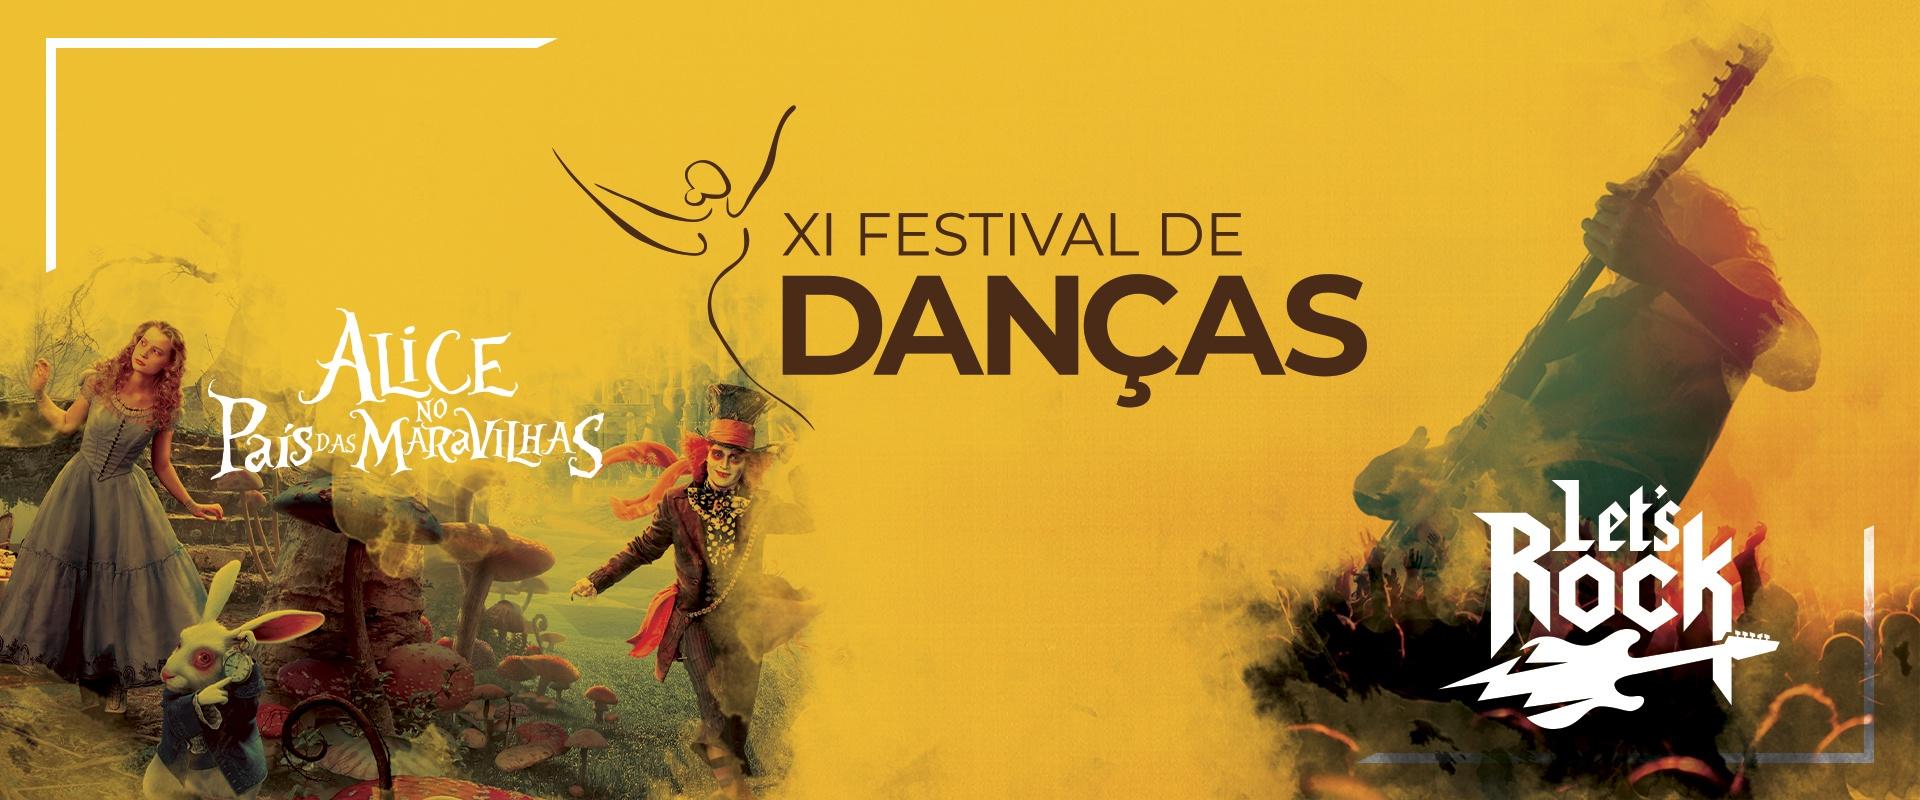 site_banner_festival de danças